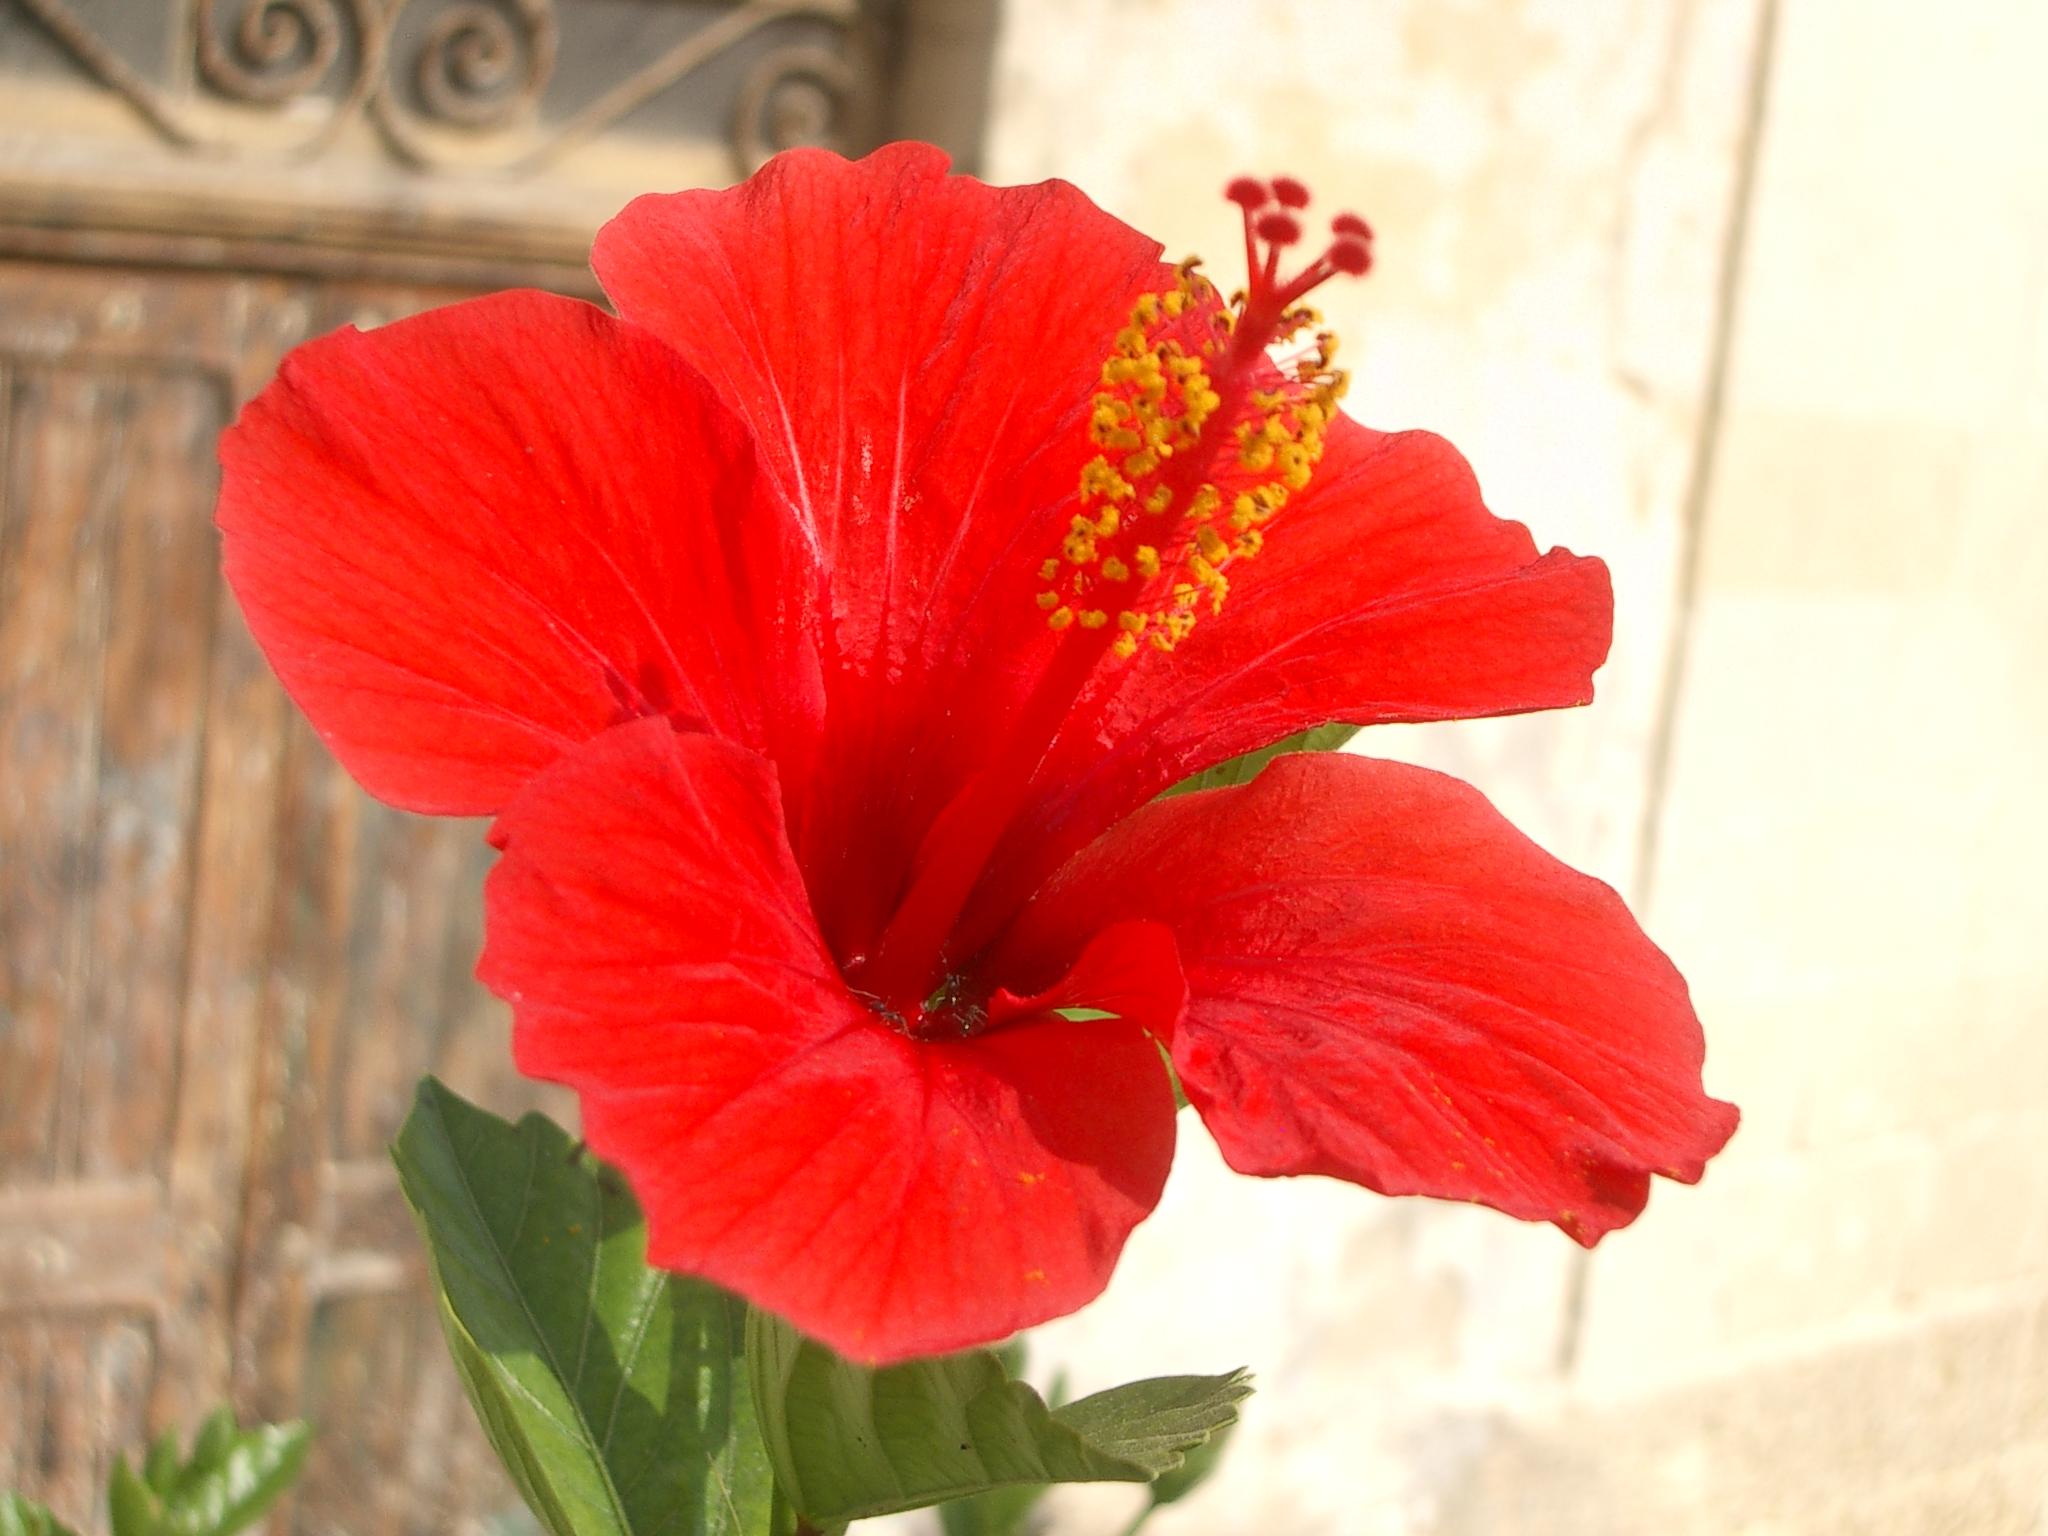 Hibiscus rosa sinensis l enhibiscus rosa sinensis 2048 x 1536 1706k jpg uploadmedia izmirmasajfo